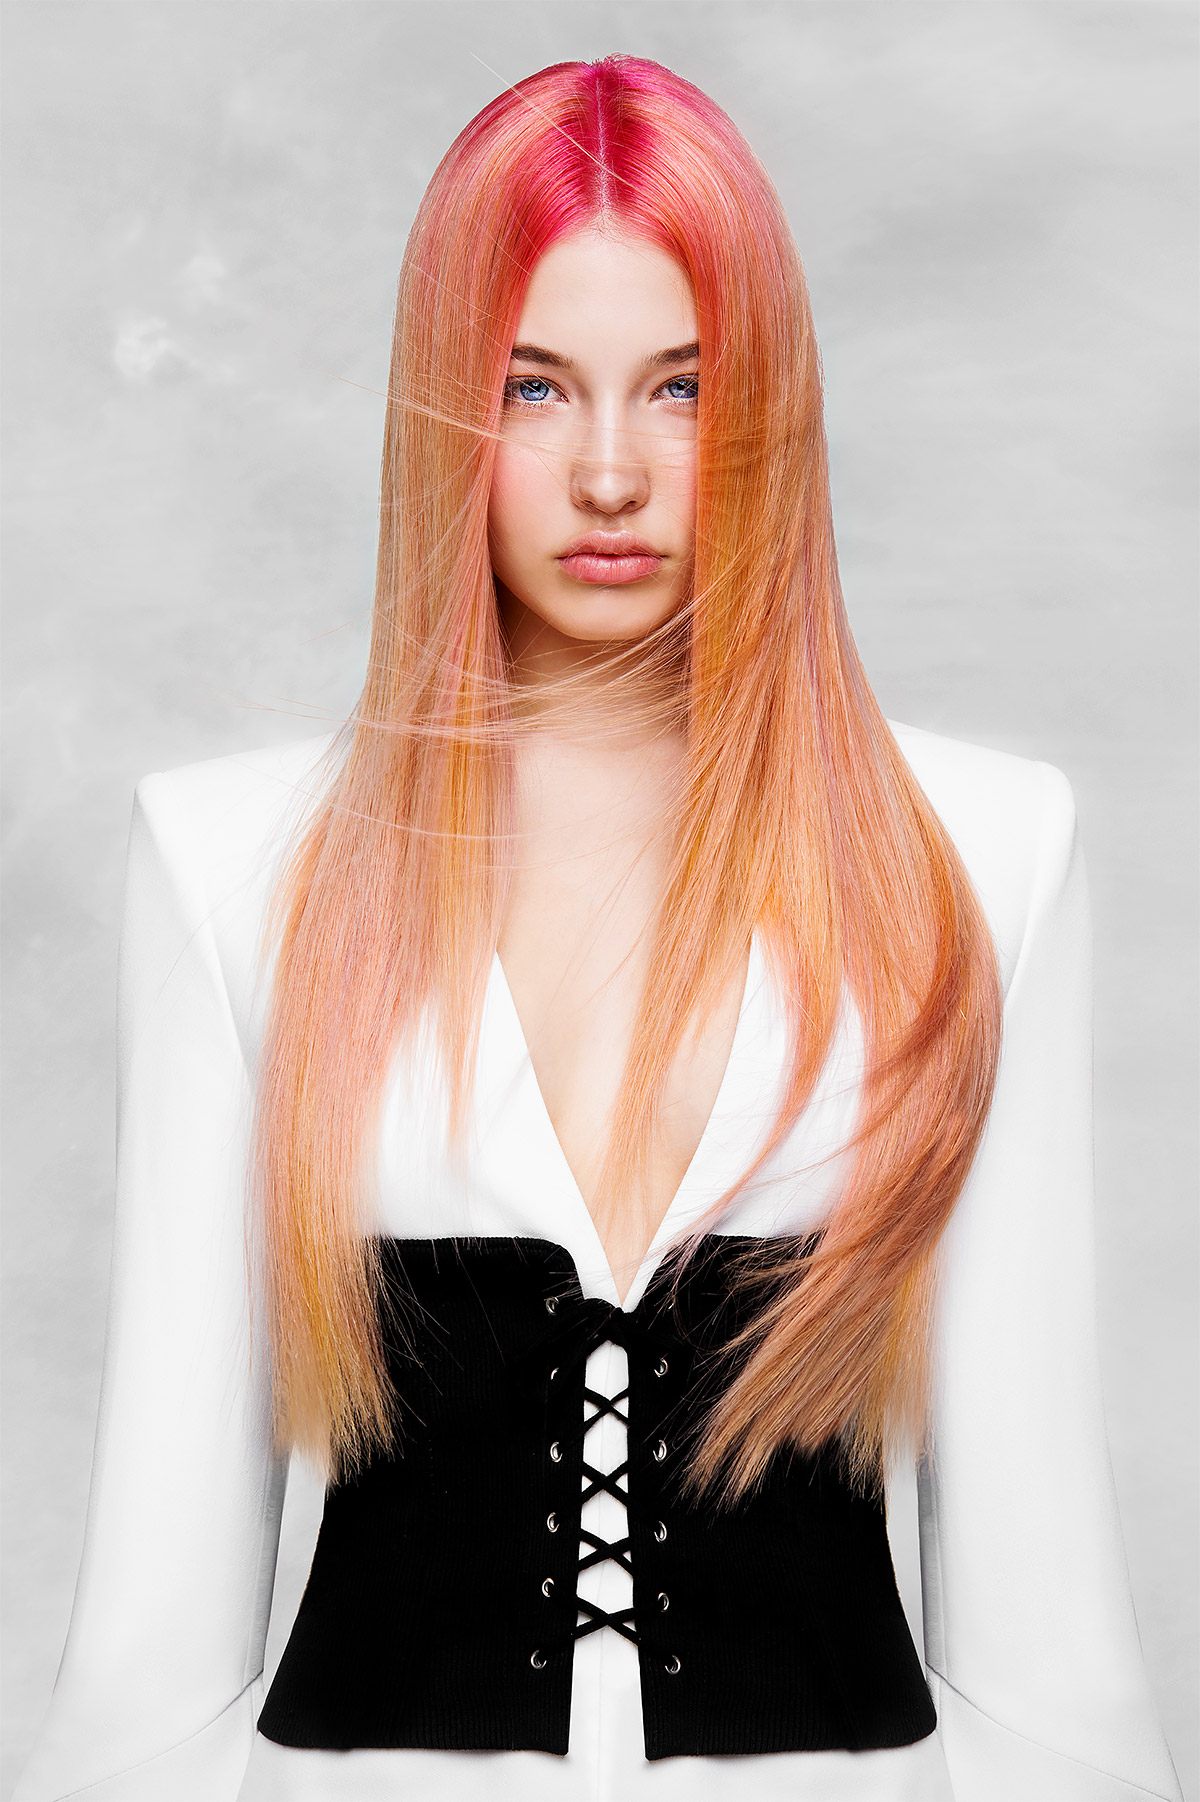 Beauty Amp Fashion Photography By Attila Udvardi Daily